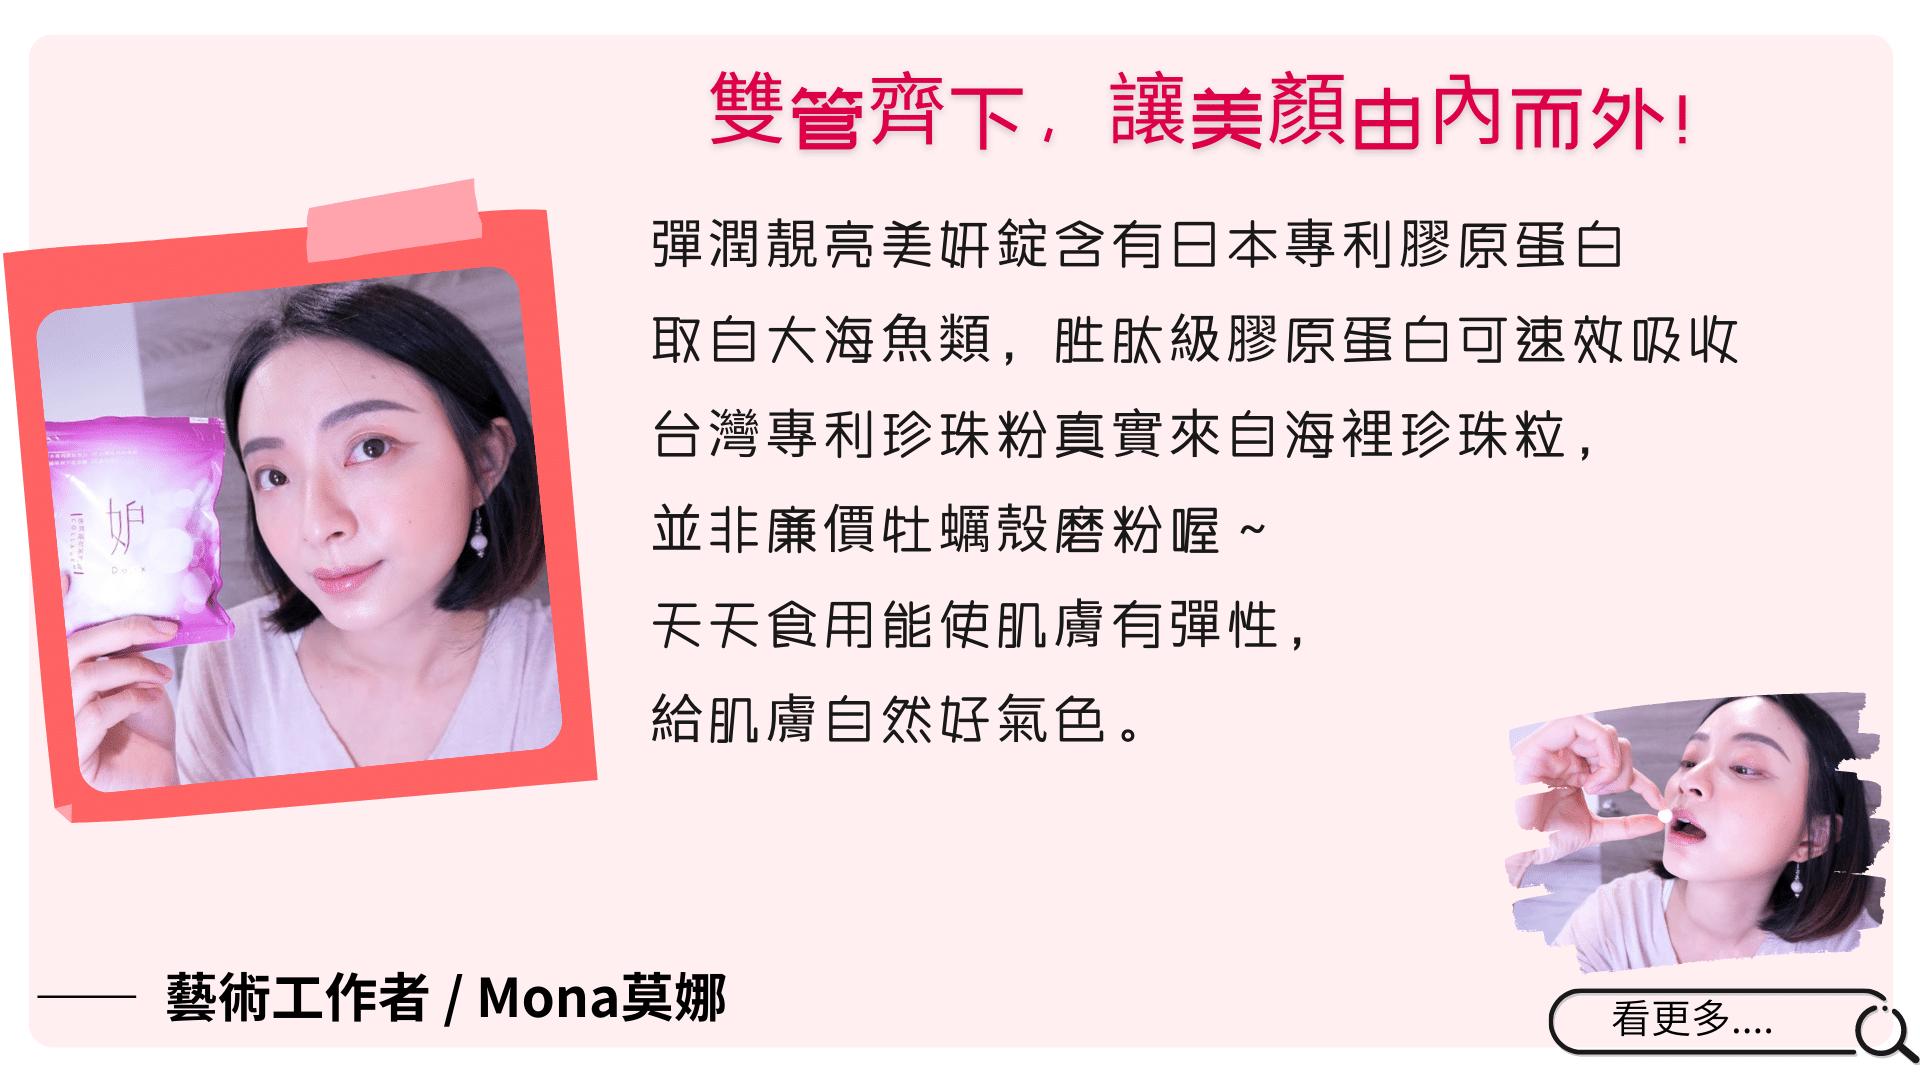 Doux妒 彈潤靚亮美妍錠 - 藝術工作者 Mona好評推薦